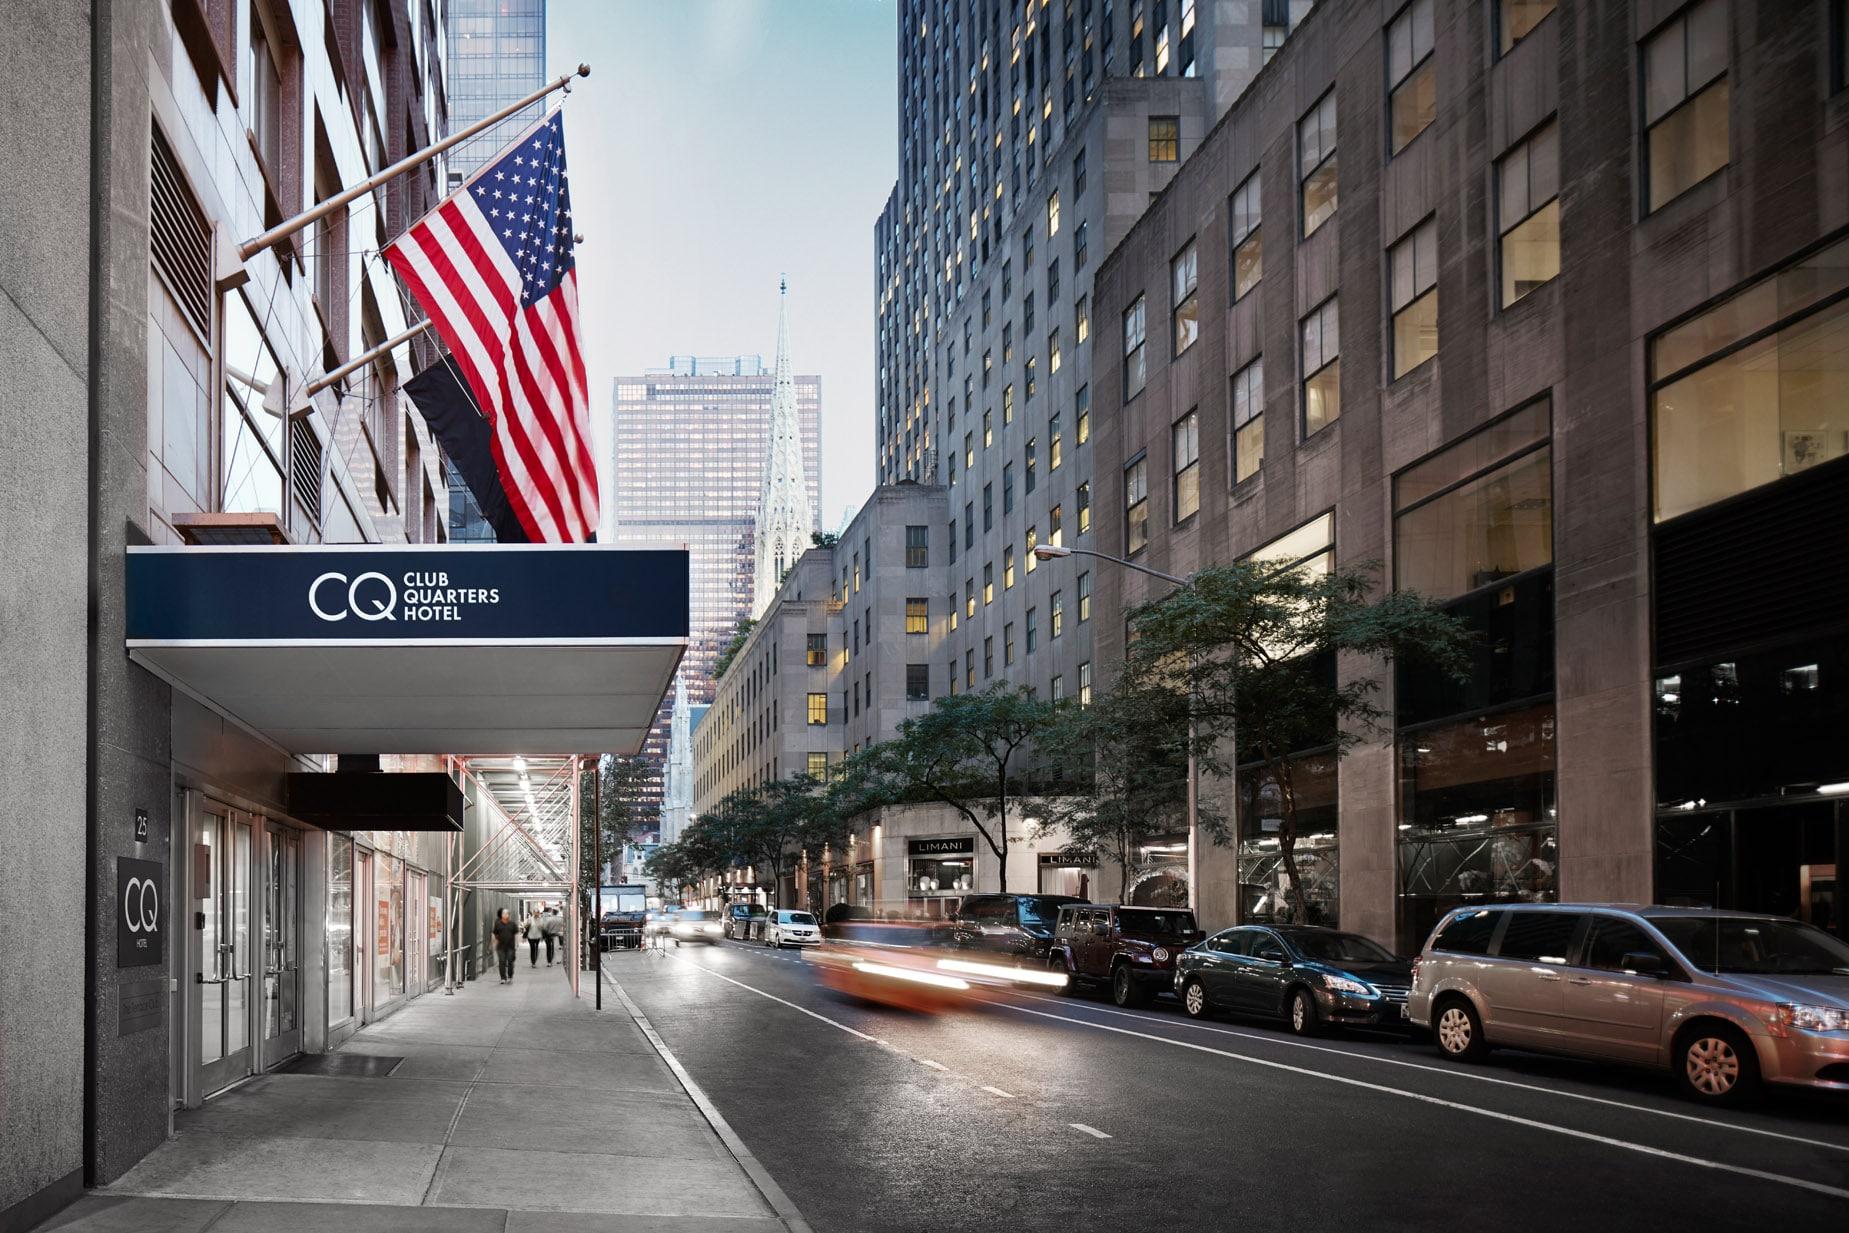 Club Quarters Hotel Rockefeller Center New York City